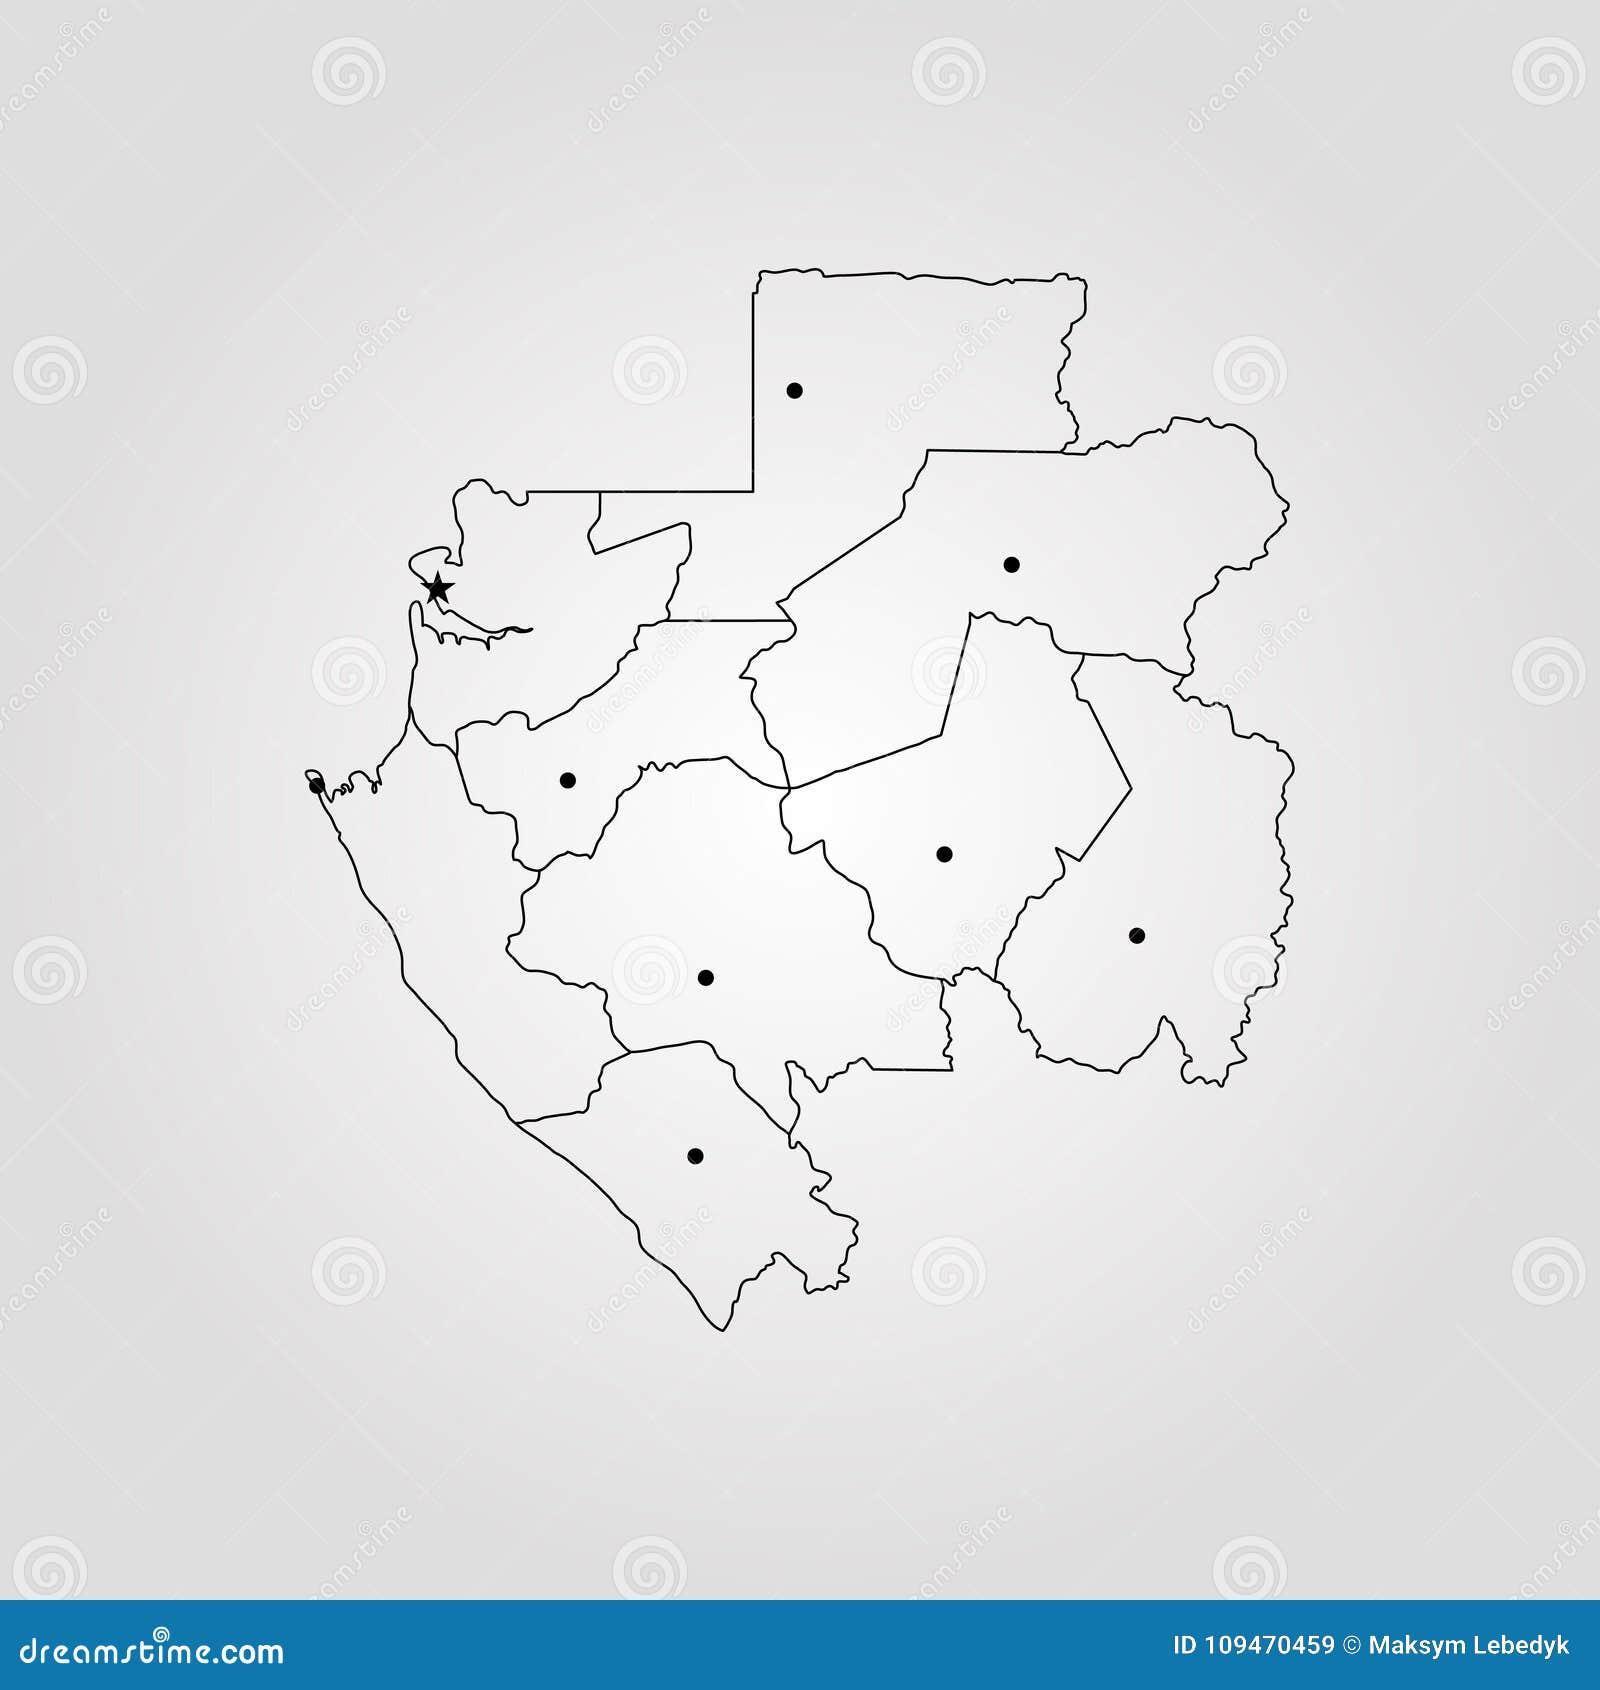 Gabon World Map.Map Of Gabon Stock Illustration Illustration Of Abstract 109470459